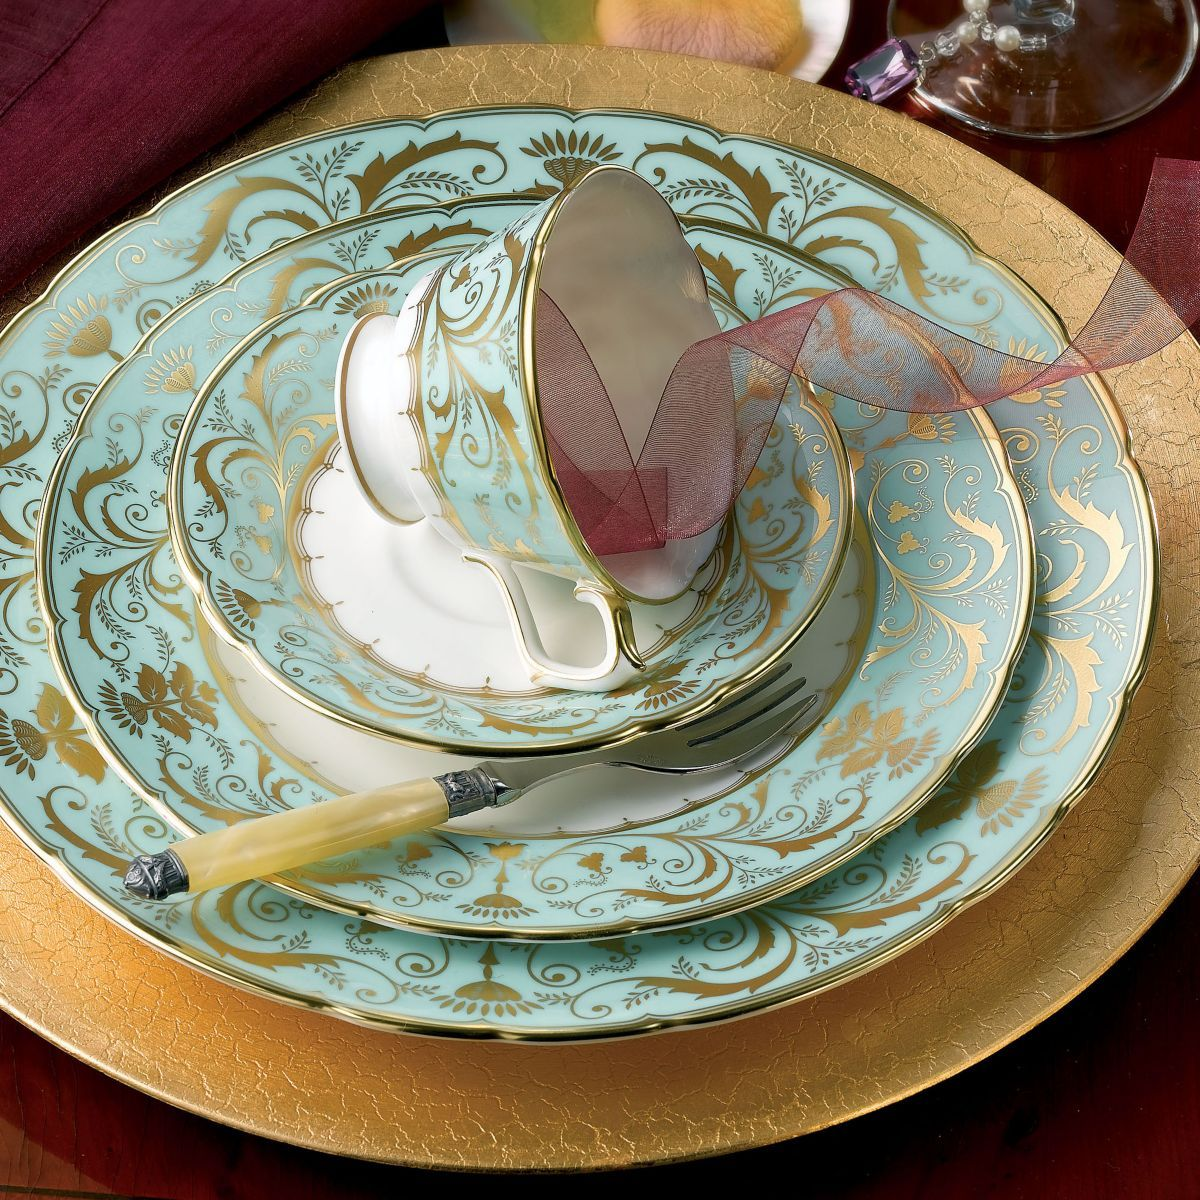 Formal dinnerware & Formal dinnerware | Turquoise+Gold | Pinterest | Royal crown derby ...